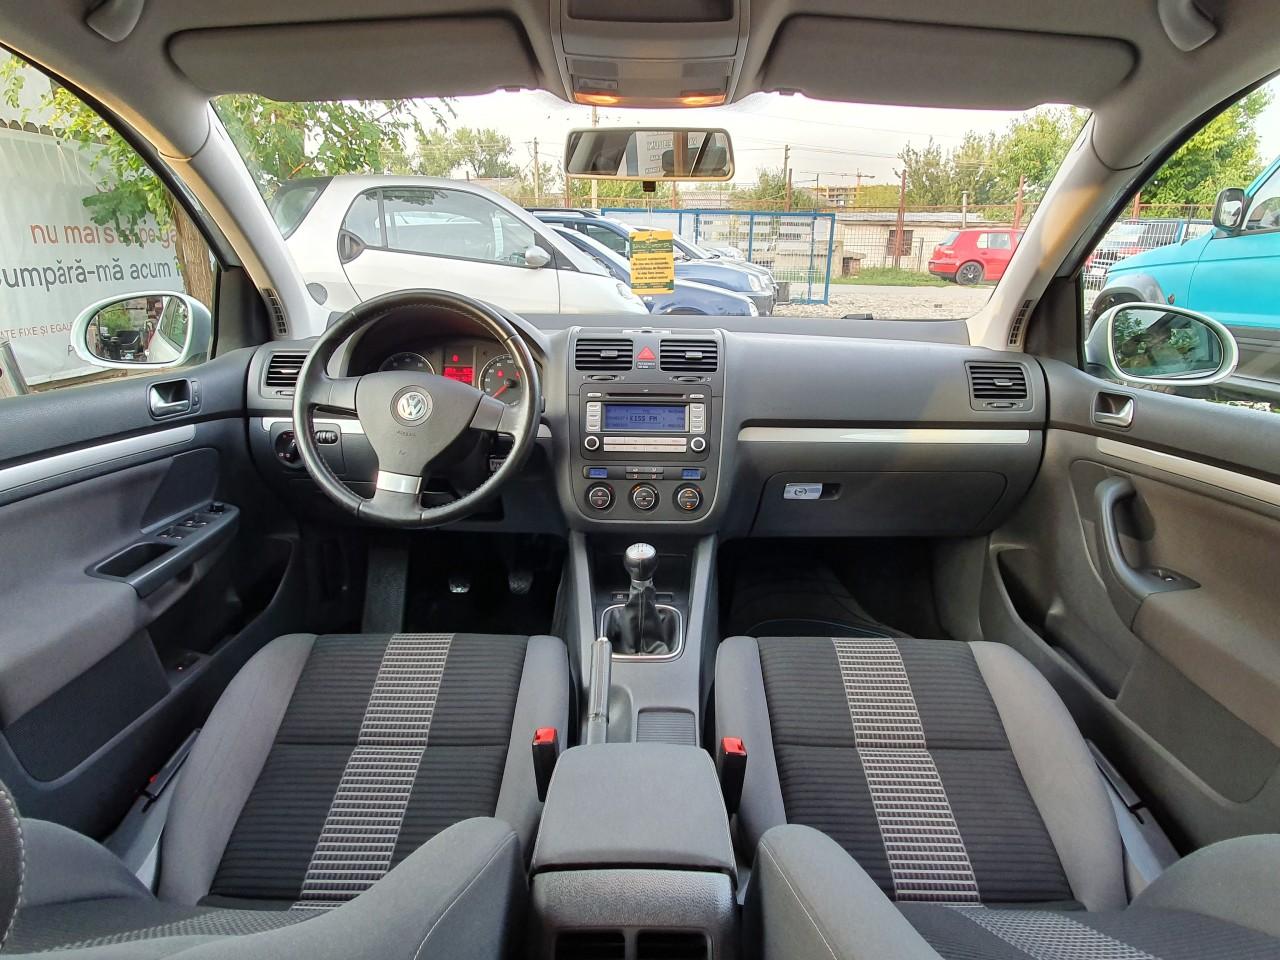 VW Golf 1.4 16v 2008